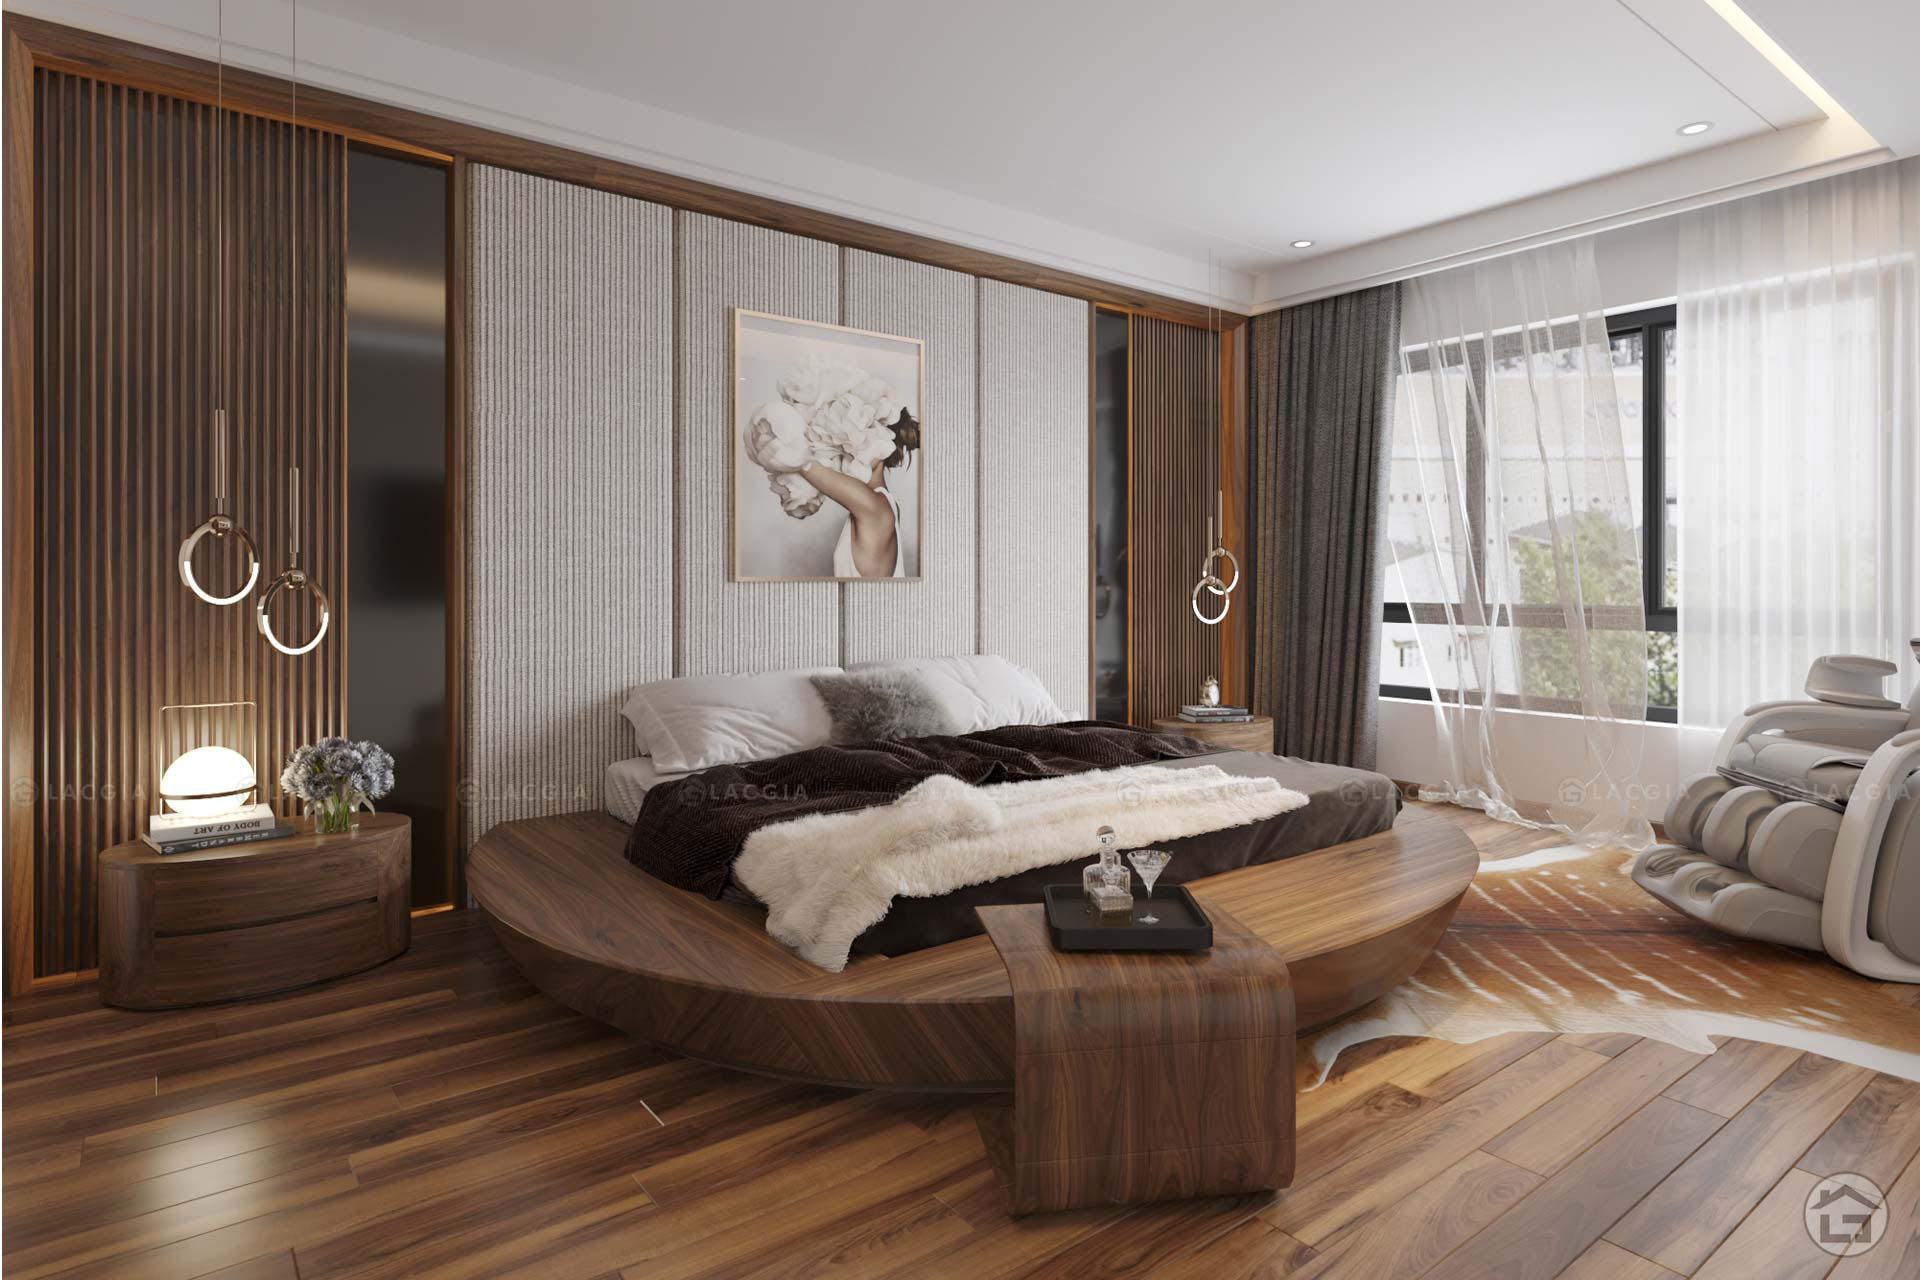 thiet ke noi that biet thu lien ke geleximco le trong tan 5 - Dự án thiết kế nội thất biệt thự Vinhomes Riverside